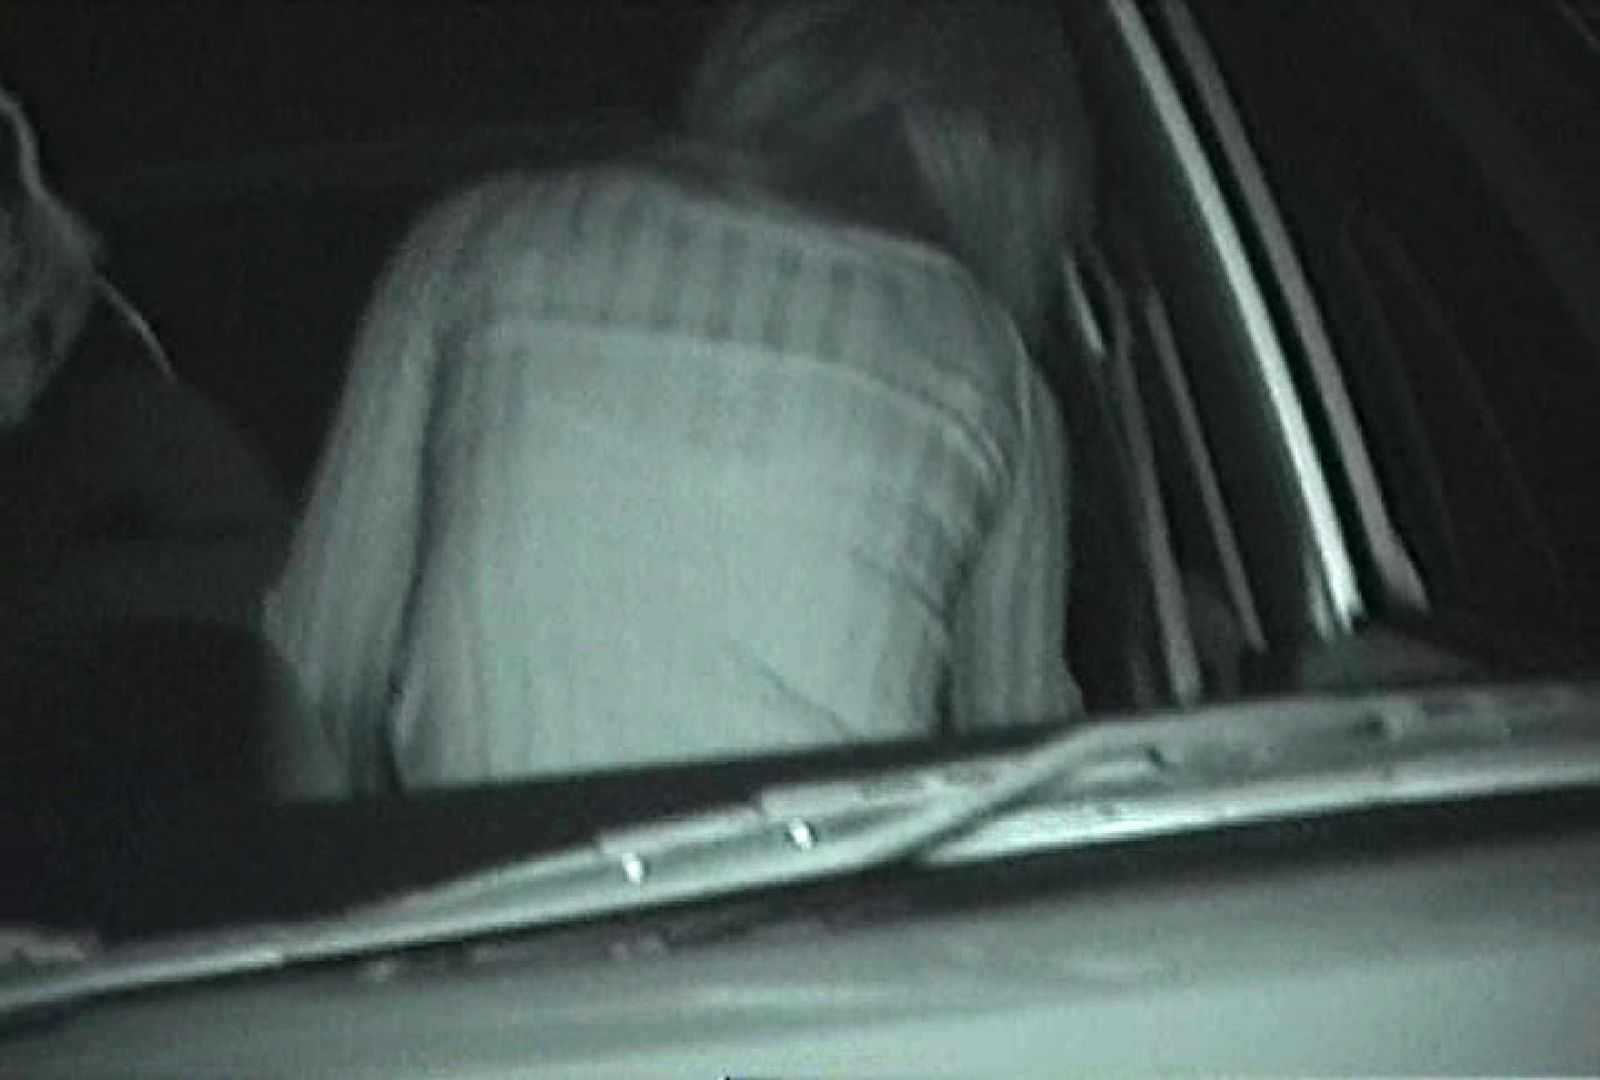 充血監督の深夜の運動会Vol.88 細身 戯れ無修正画像 73画像 64